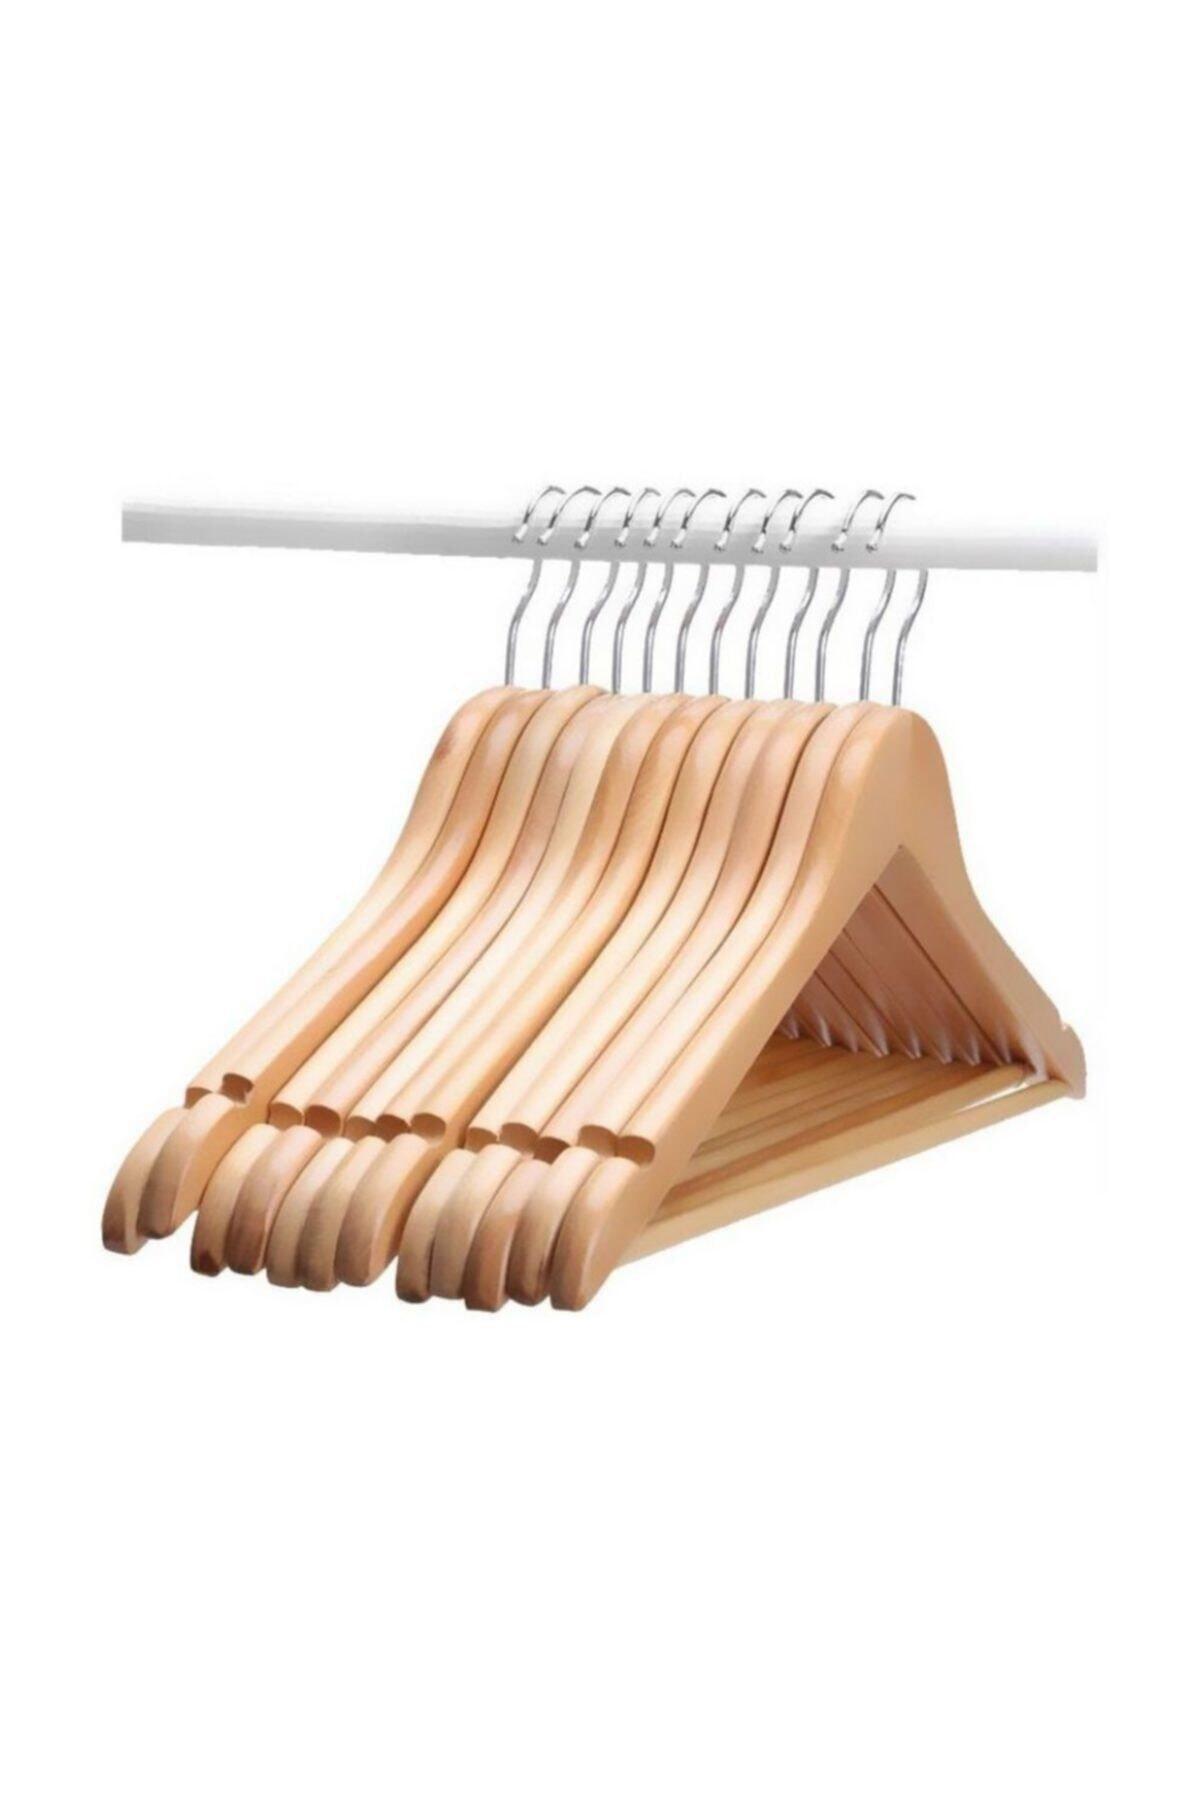 Elbise Askısı Ahşap Kıyafet Askılık 12 Adet Vernikli